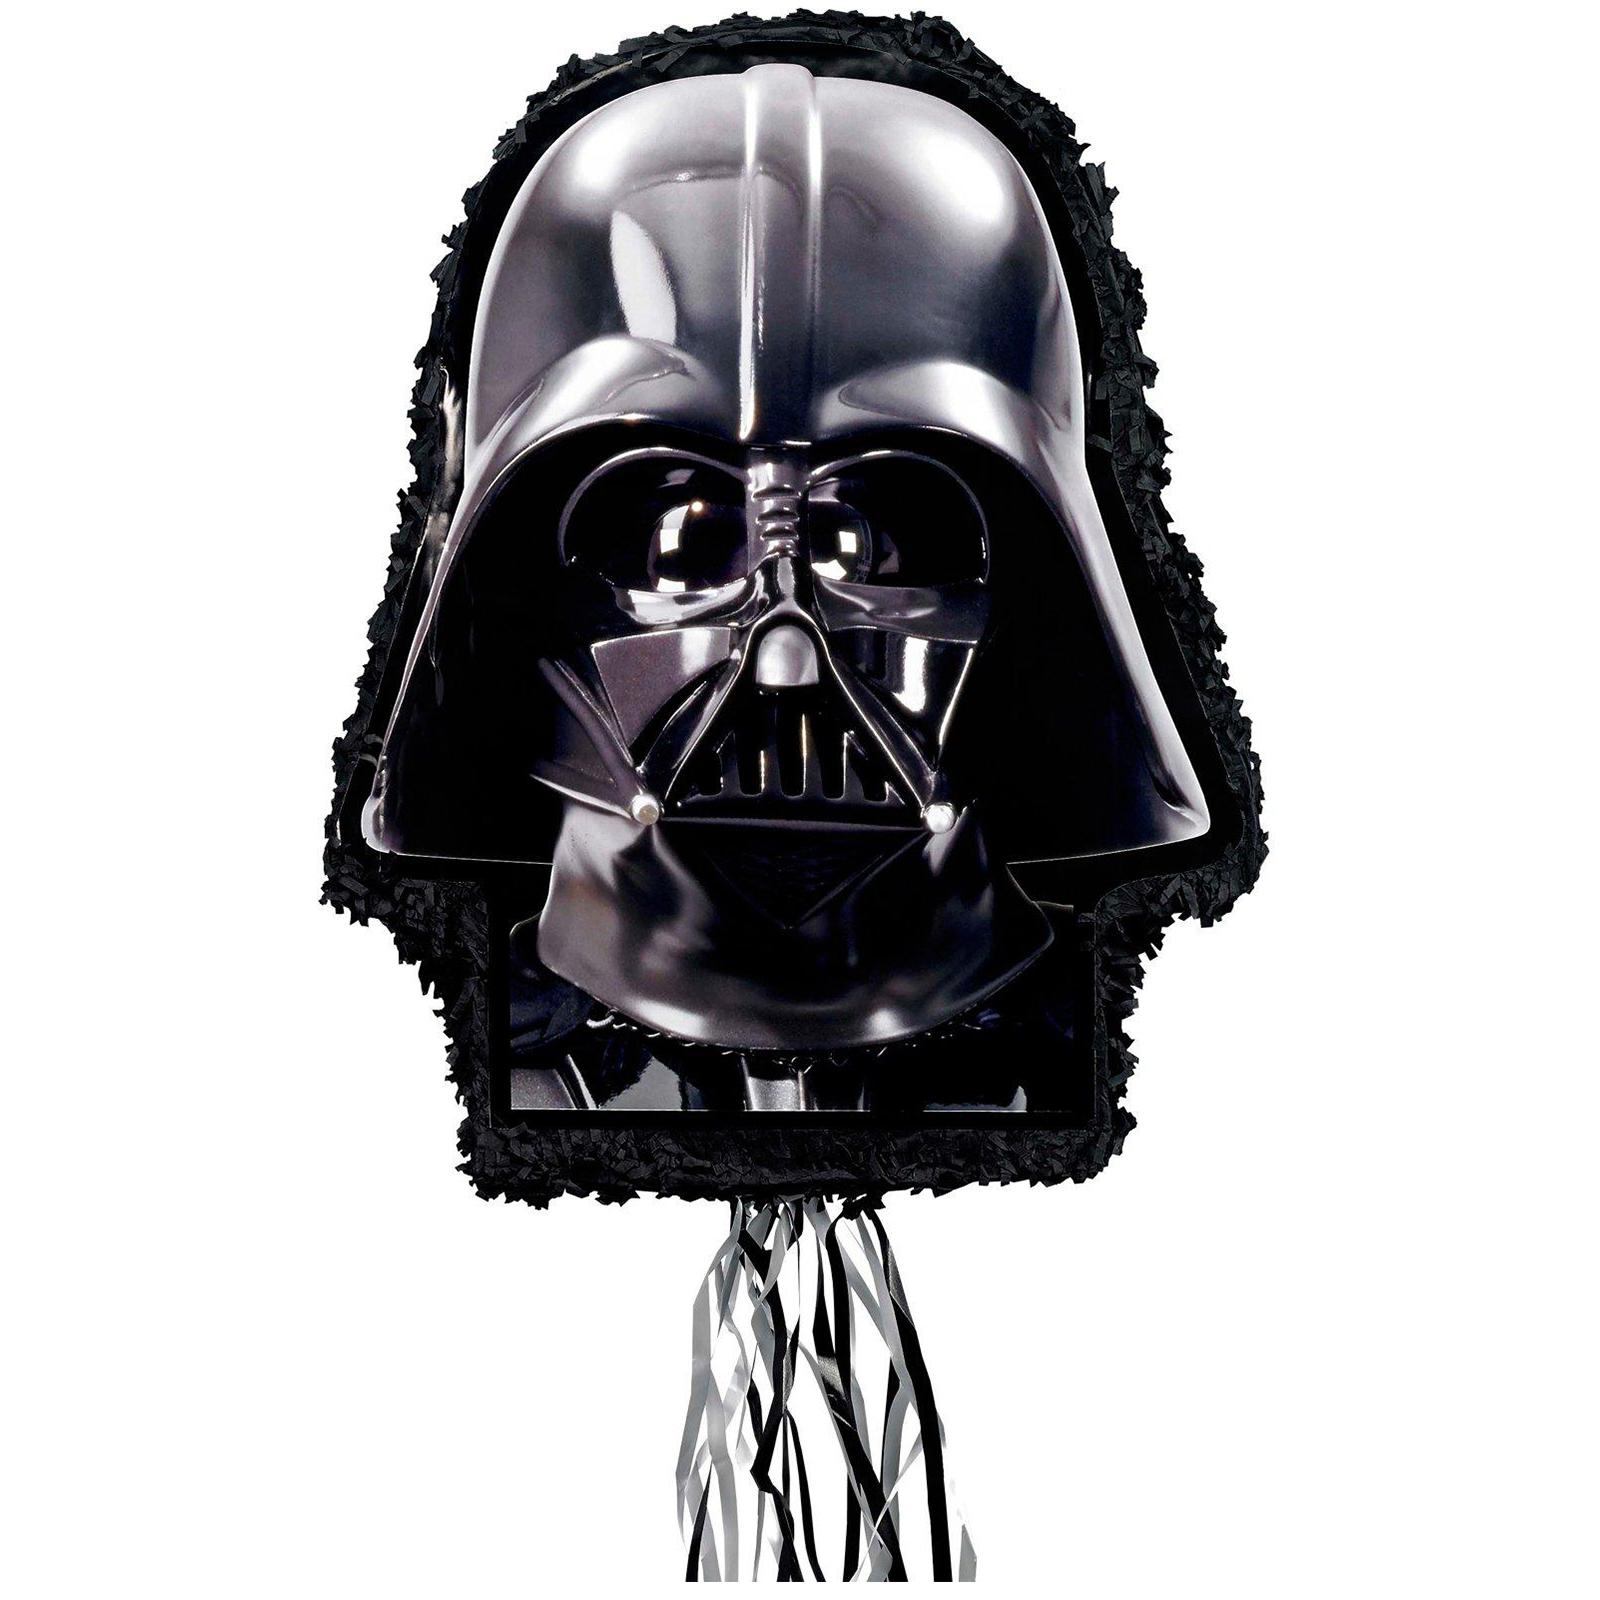 Star Wars Darth Vader Pull-string Pinata